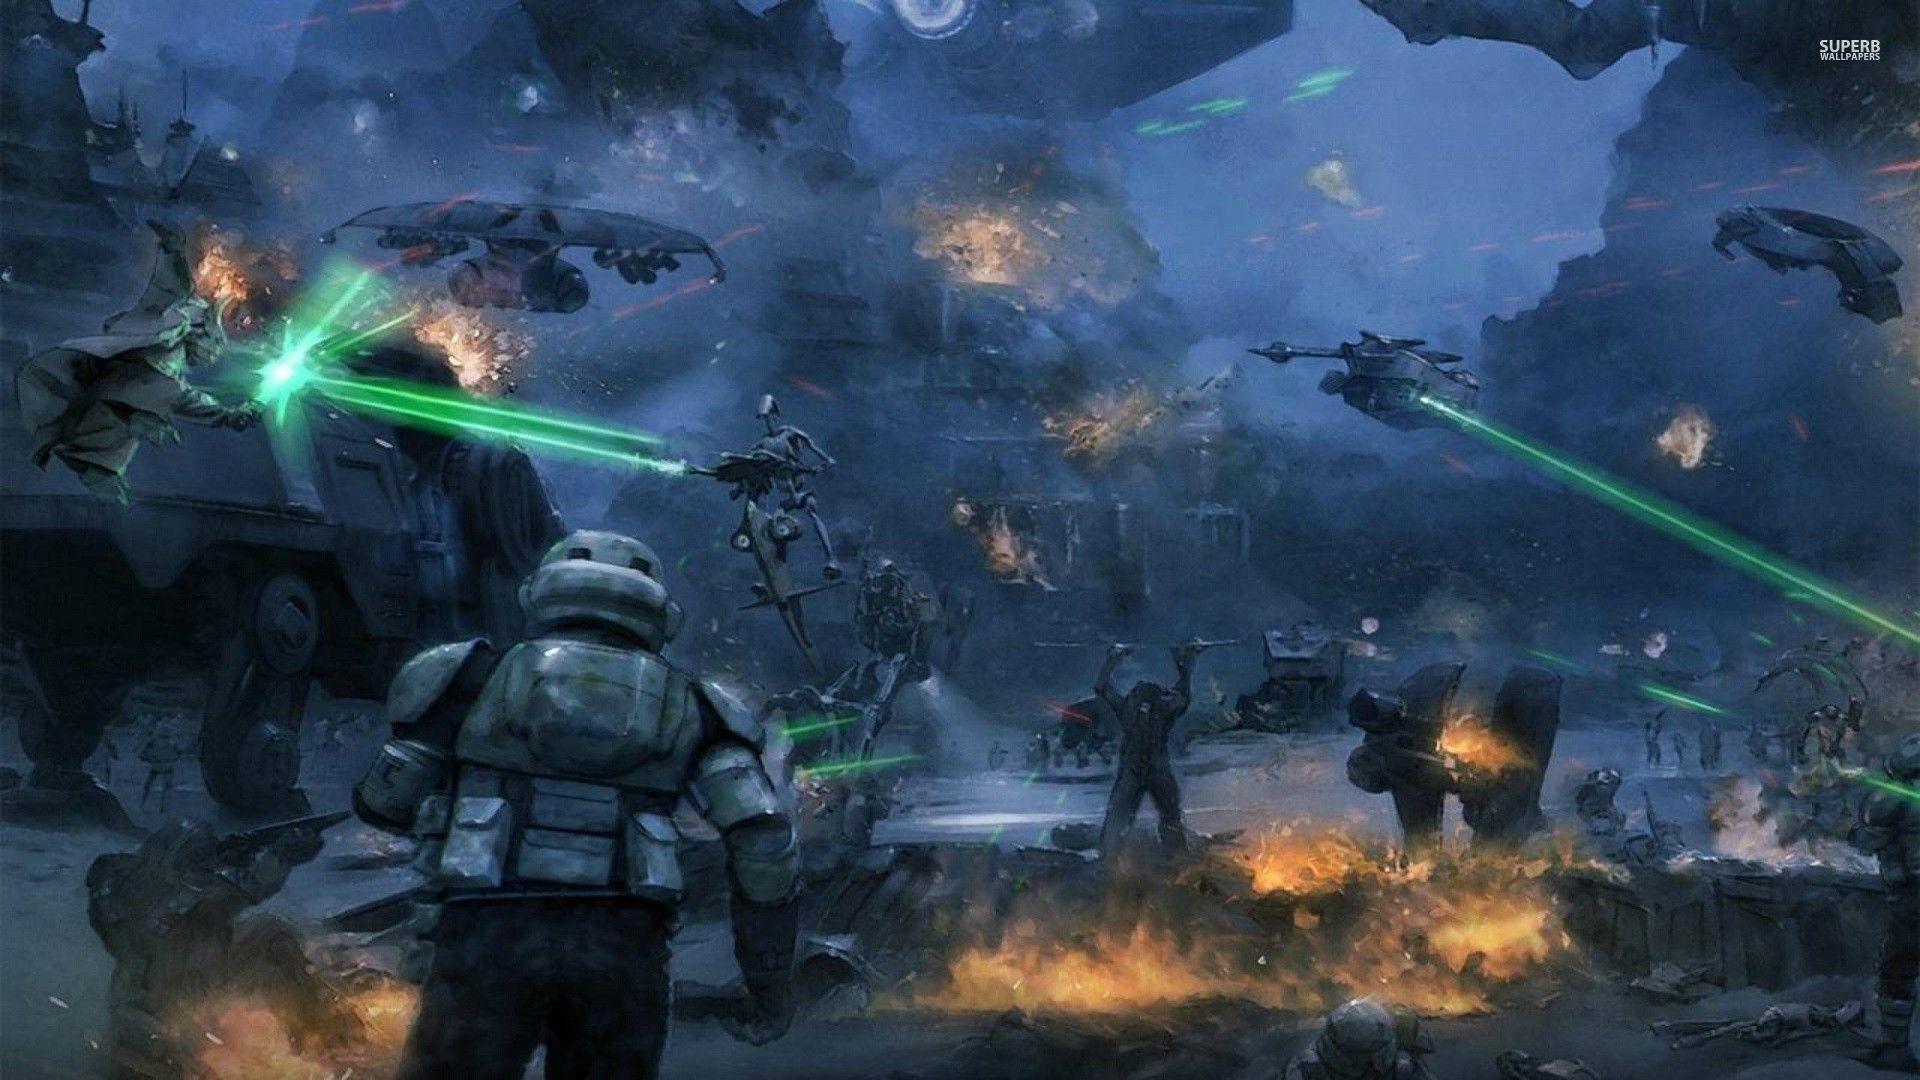 Star Wars Battle Backgrounds: 501St Clone Trooper Wallpaper (64+ Images